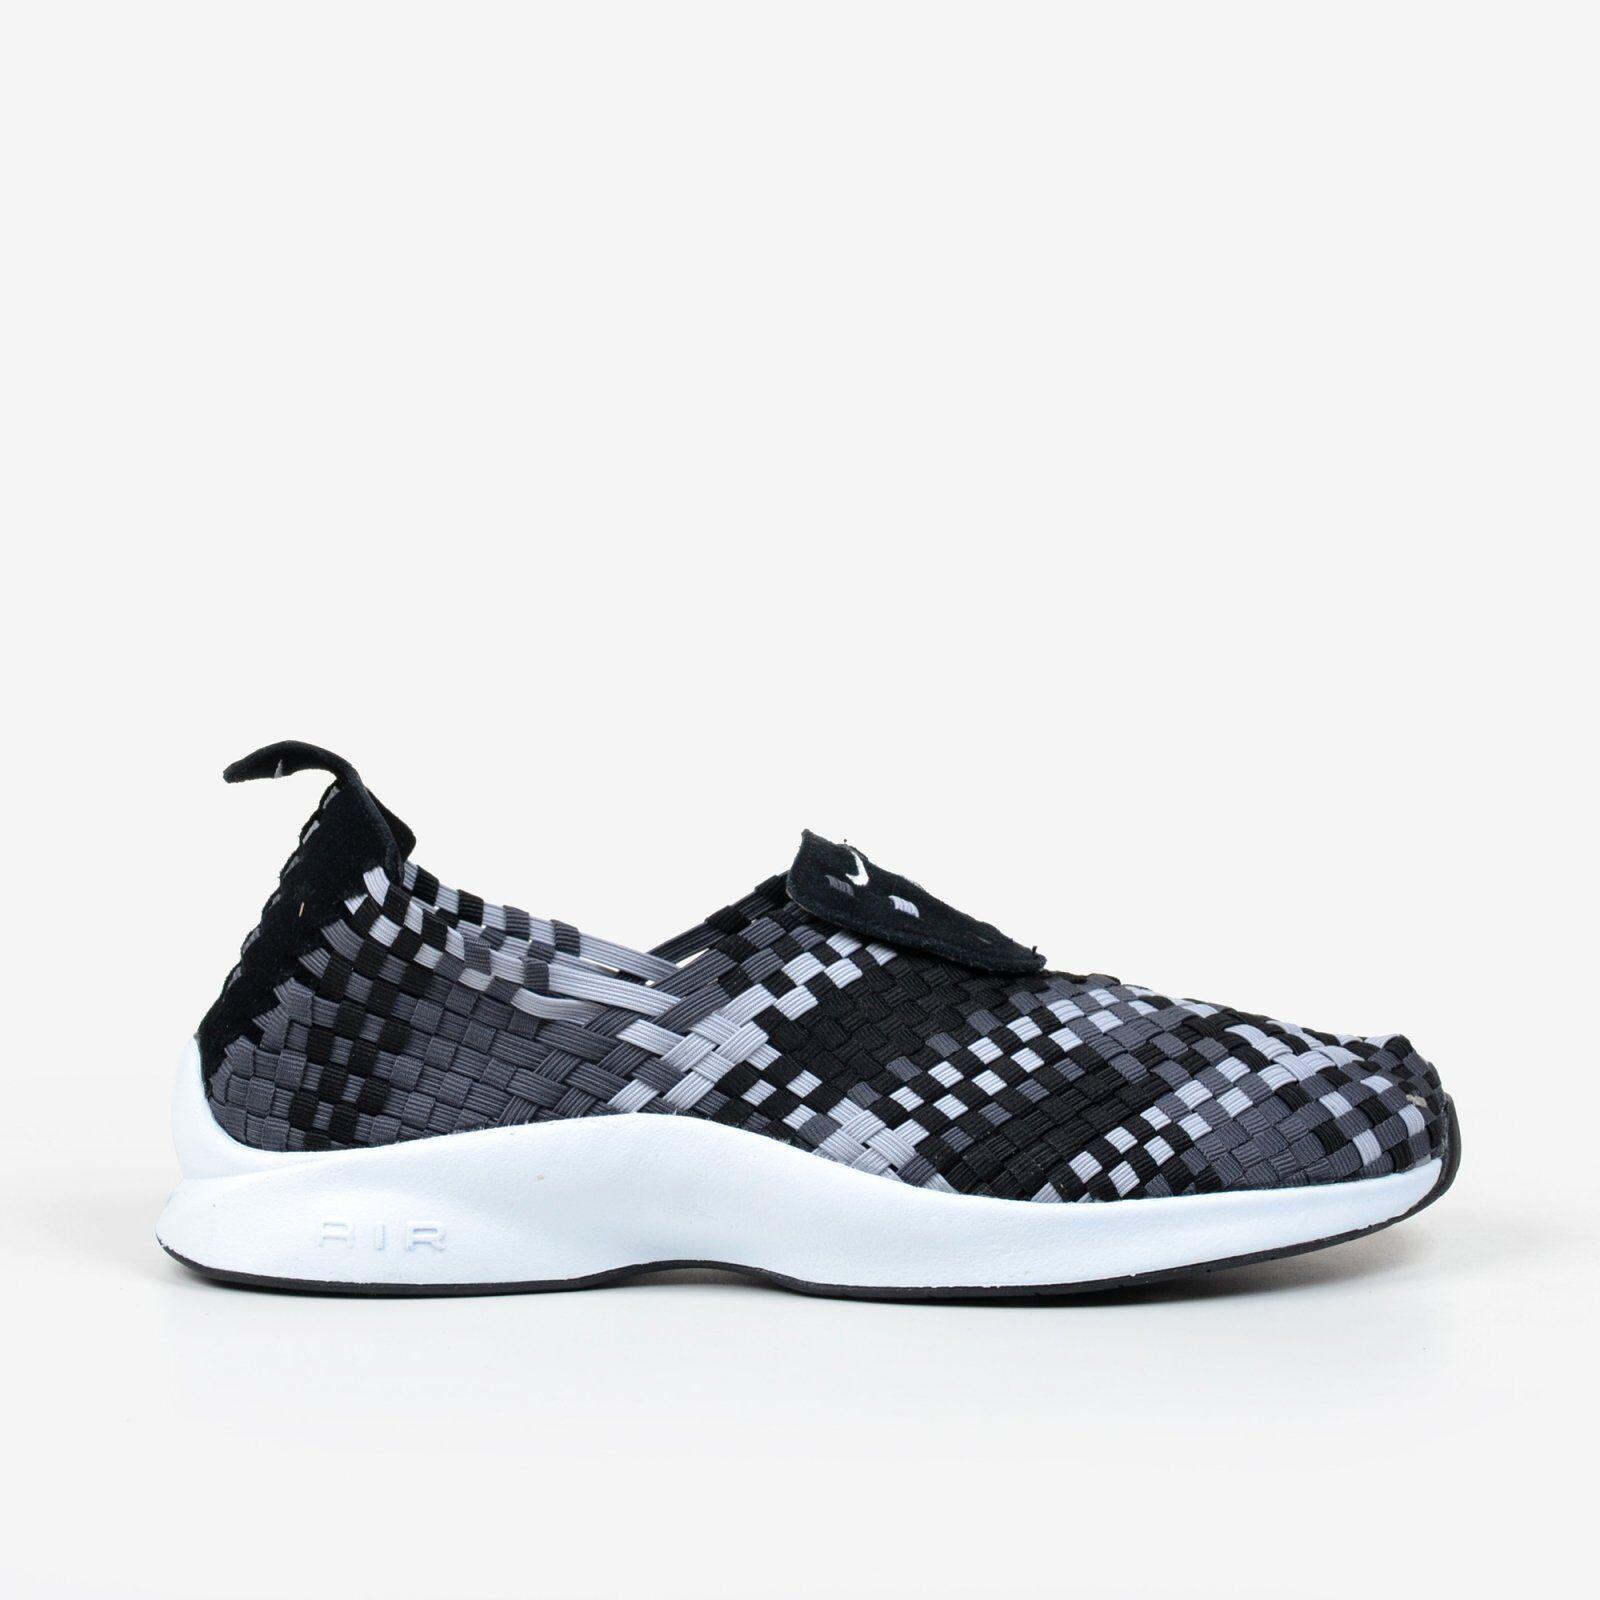 Nike Shoes Air Woven Black Wolf Grey Dark Grey Men's Shoes Nike NIB 312422-006 54f357